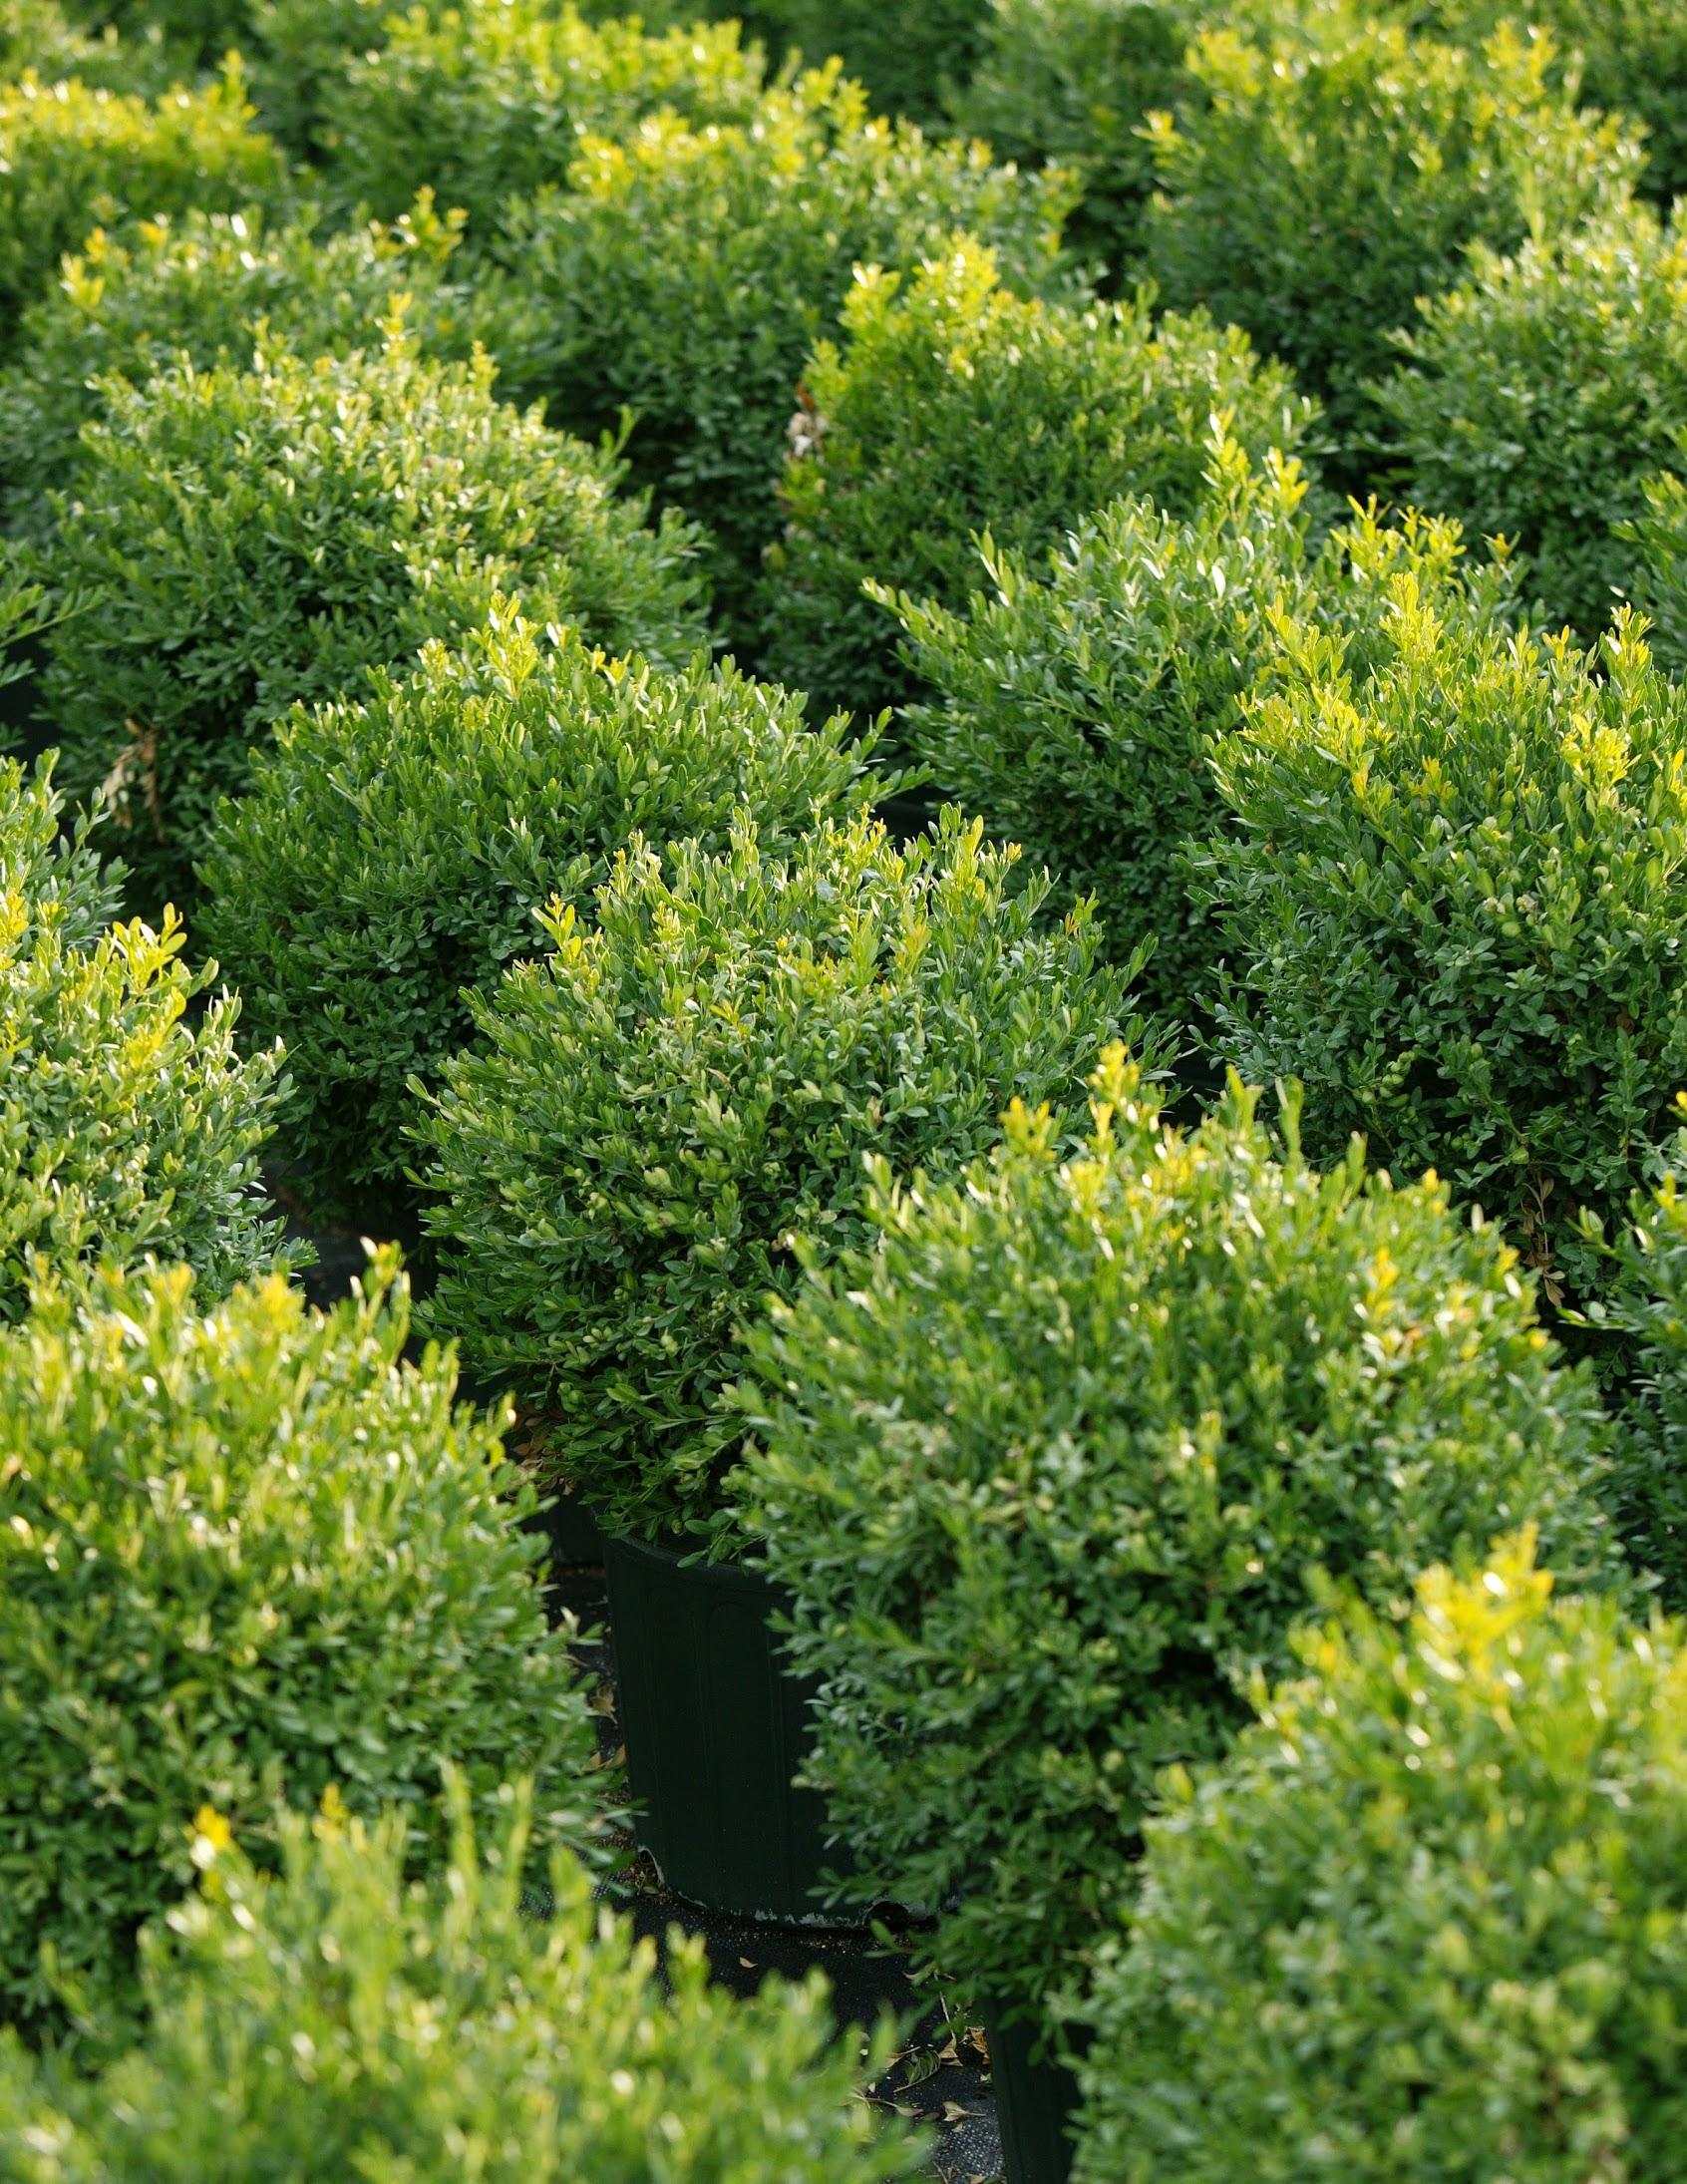 - evergreen shrubs